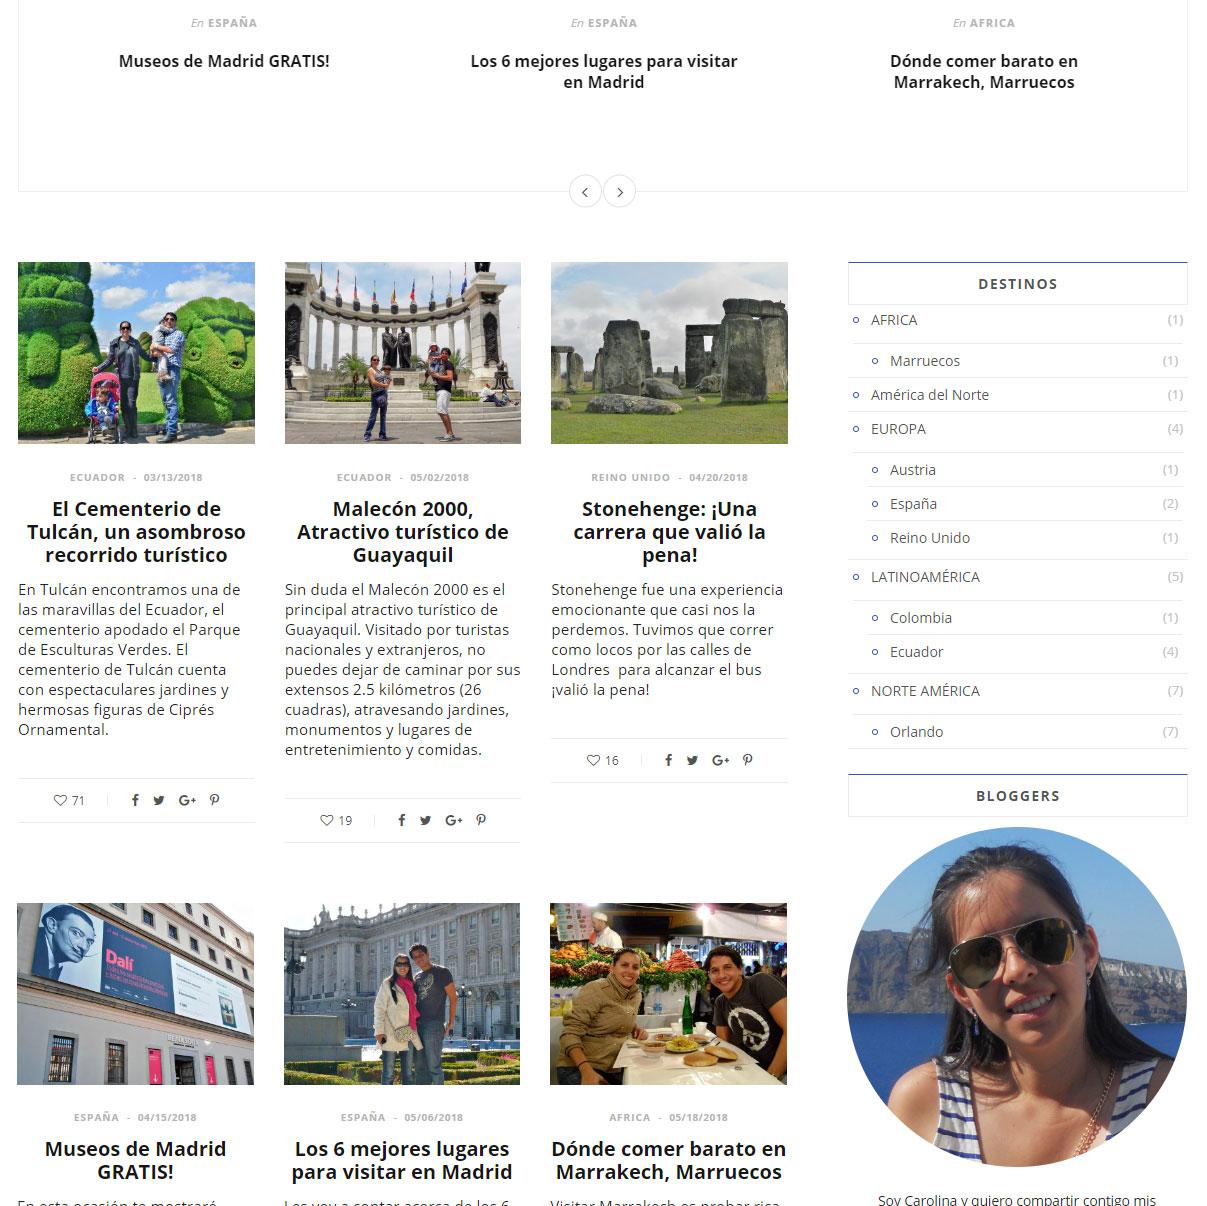 Diseño Web de 4everviajeros.com | PORTAFOLIO DE KOLASH